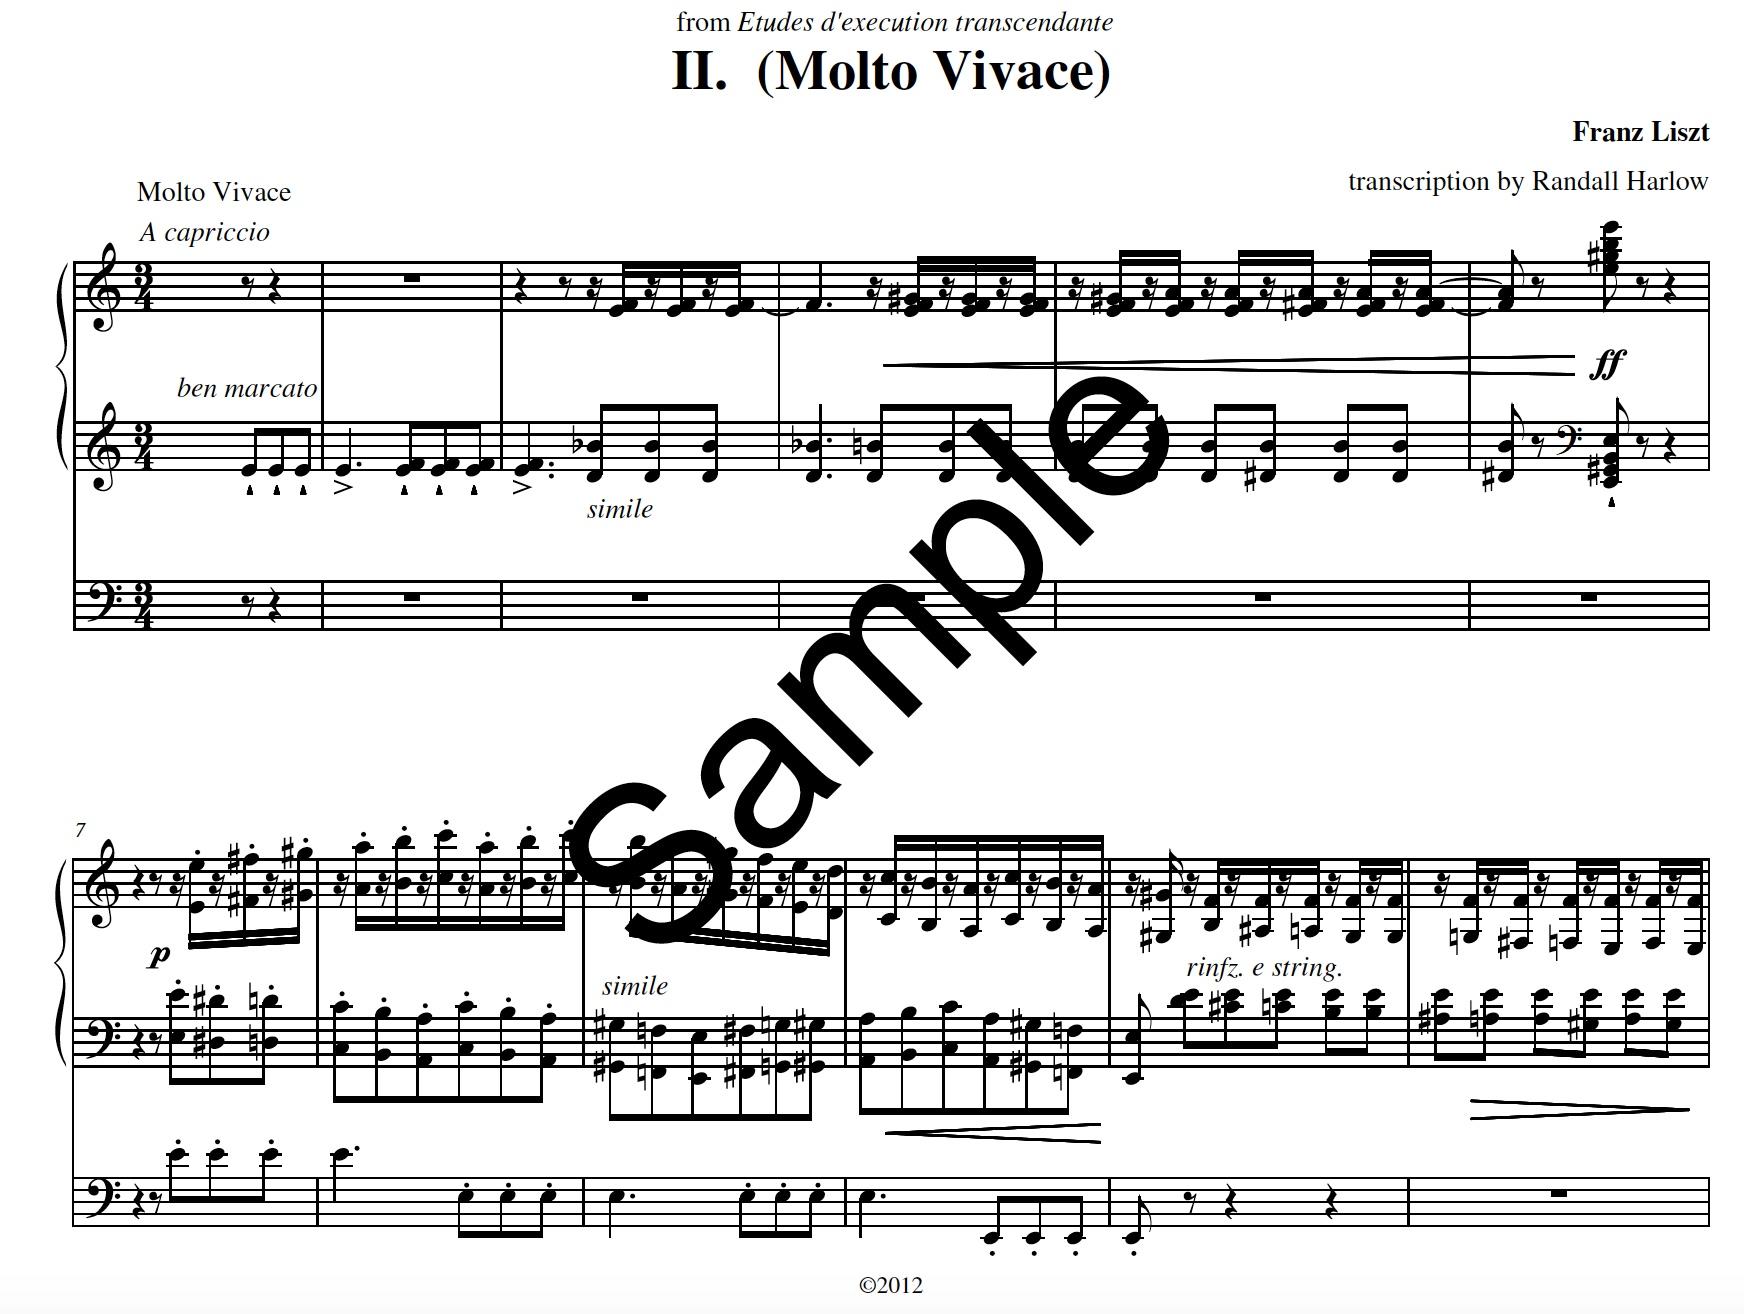 Liszt Transcendental Etudes Molto Vivace  transcribed for organ